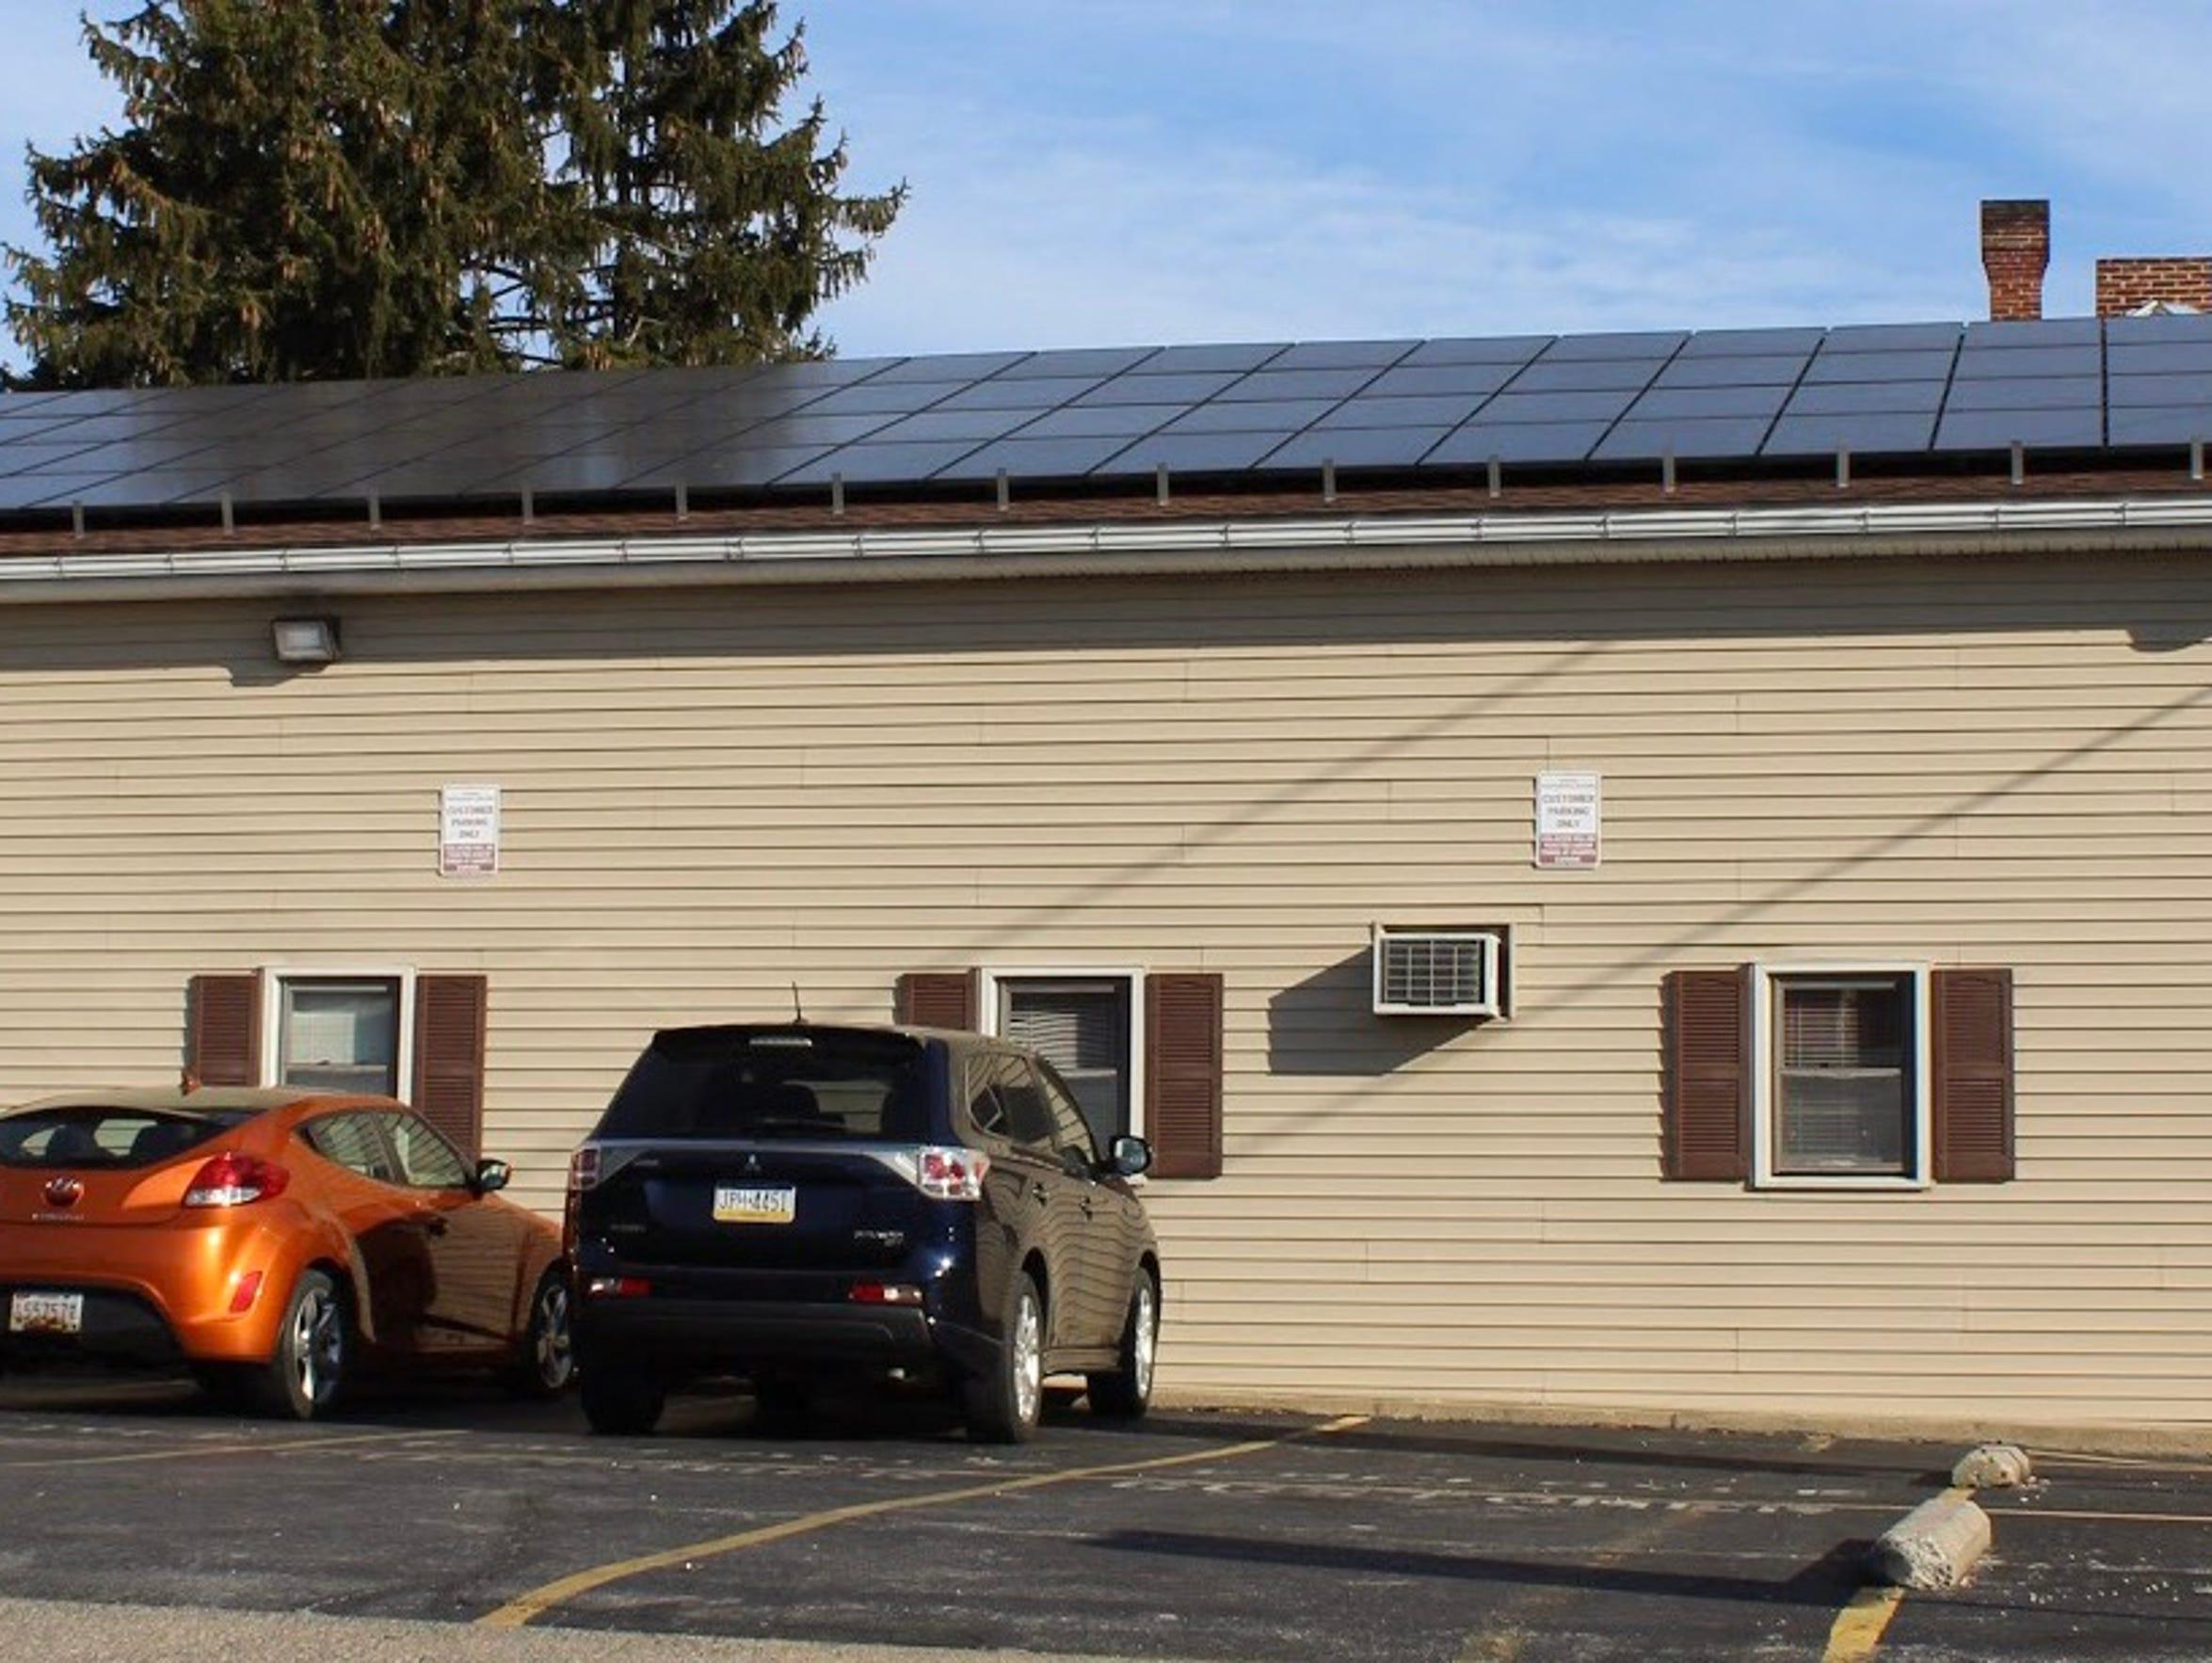 Business owner Mike Cermak installed 96 solar panels